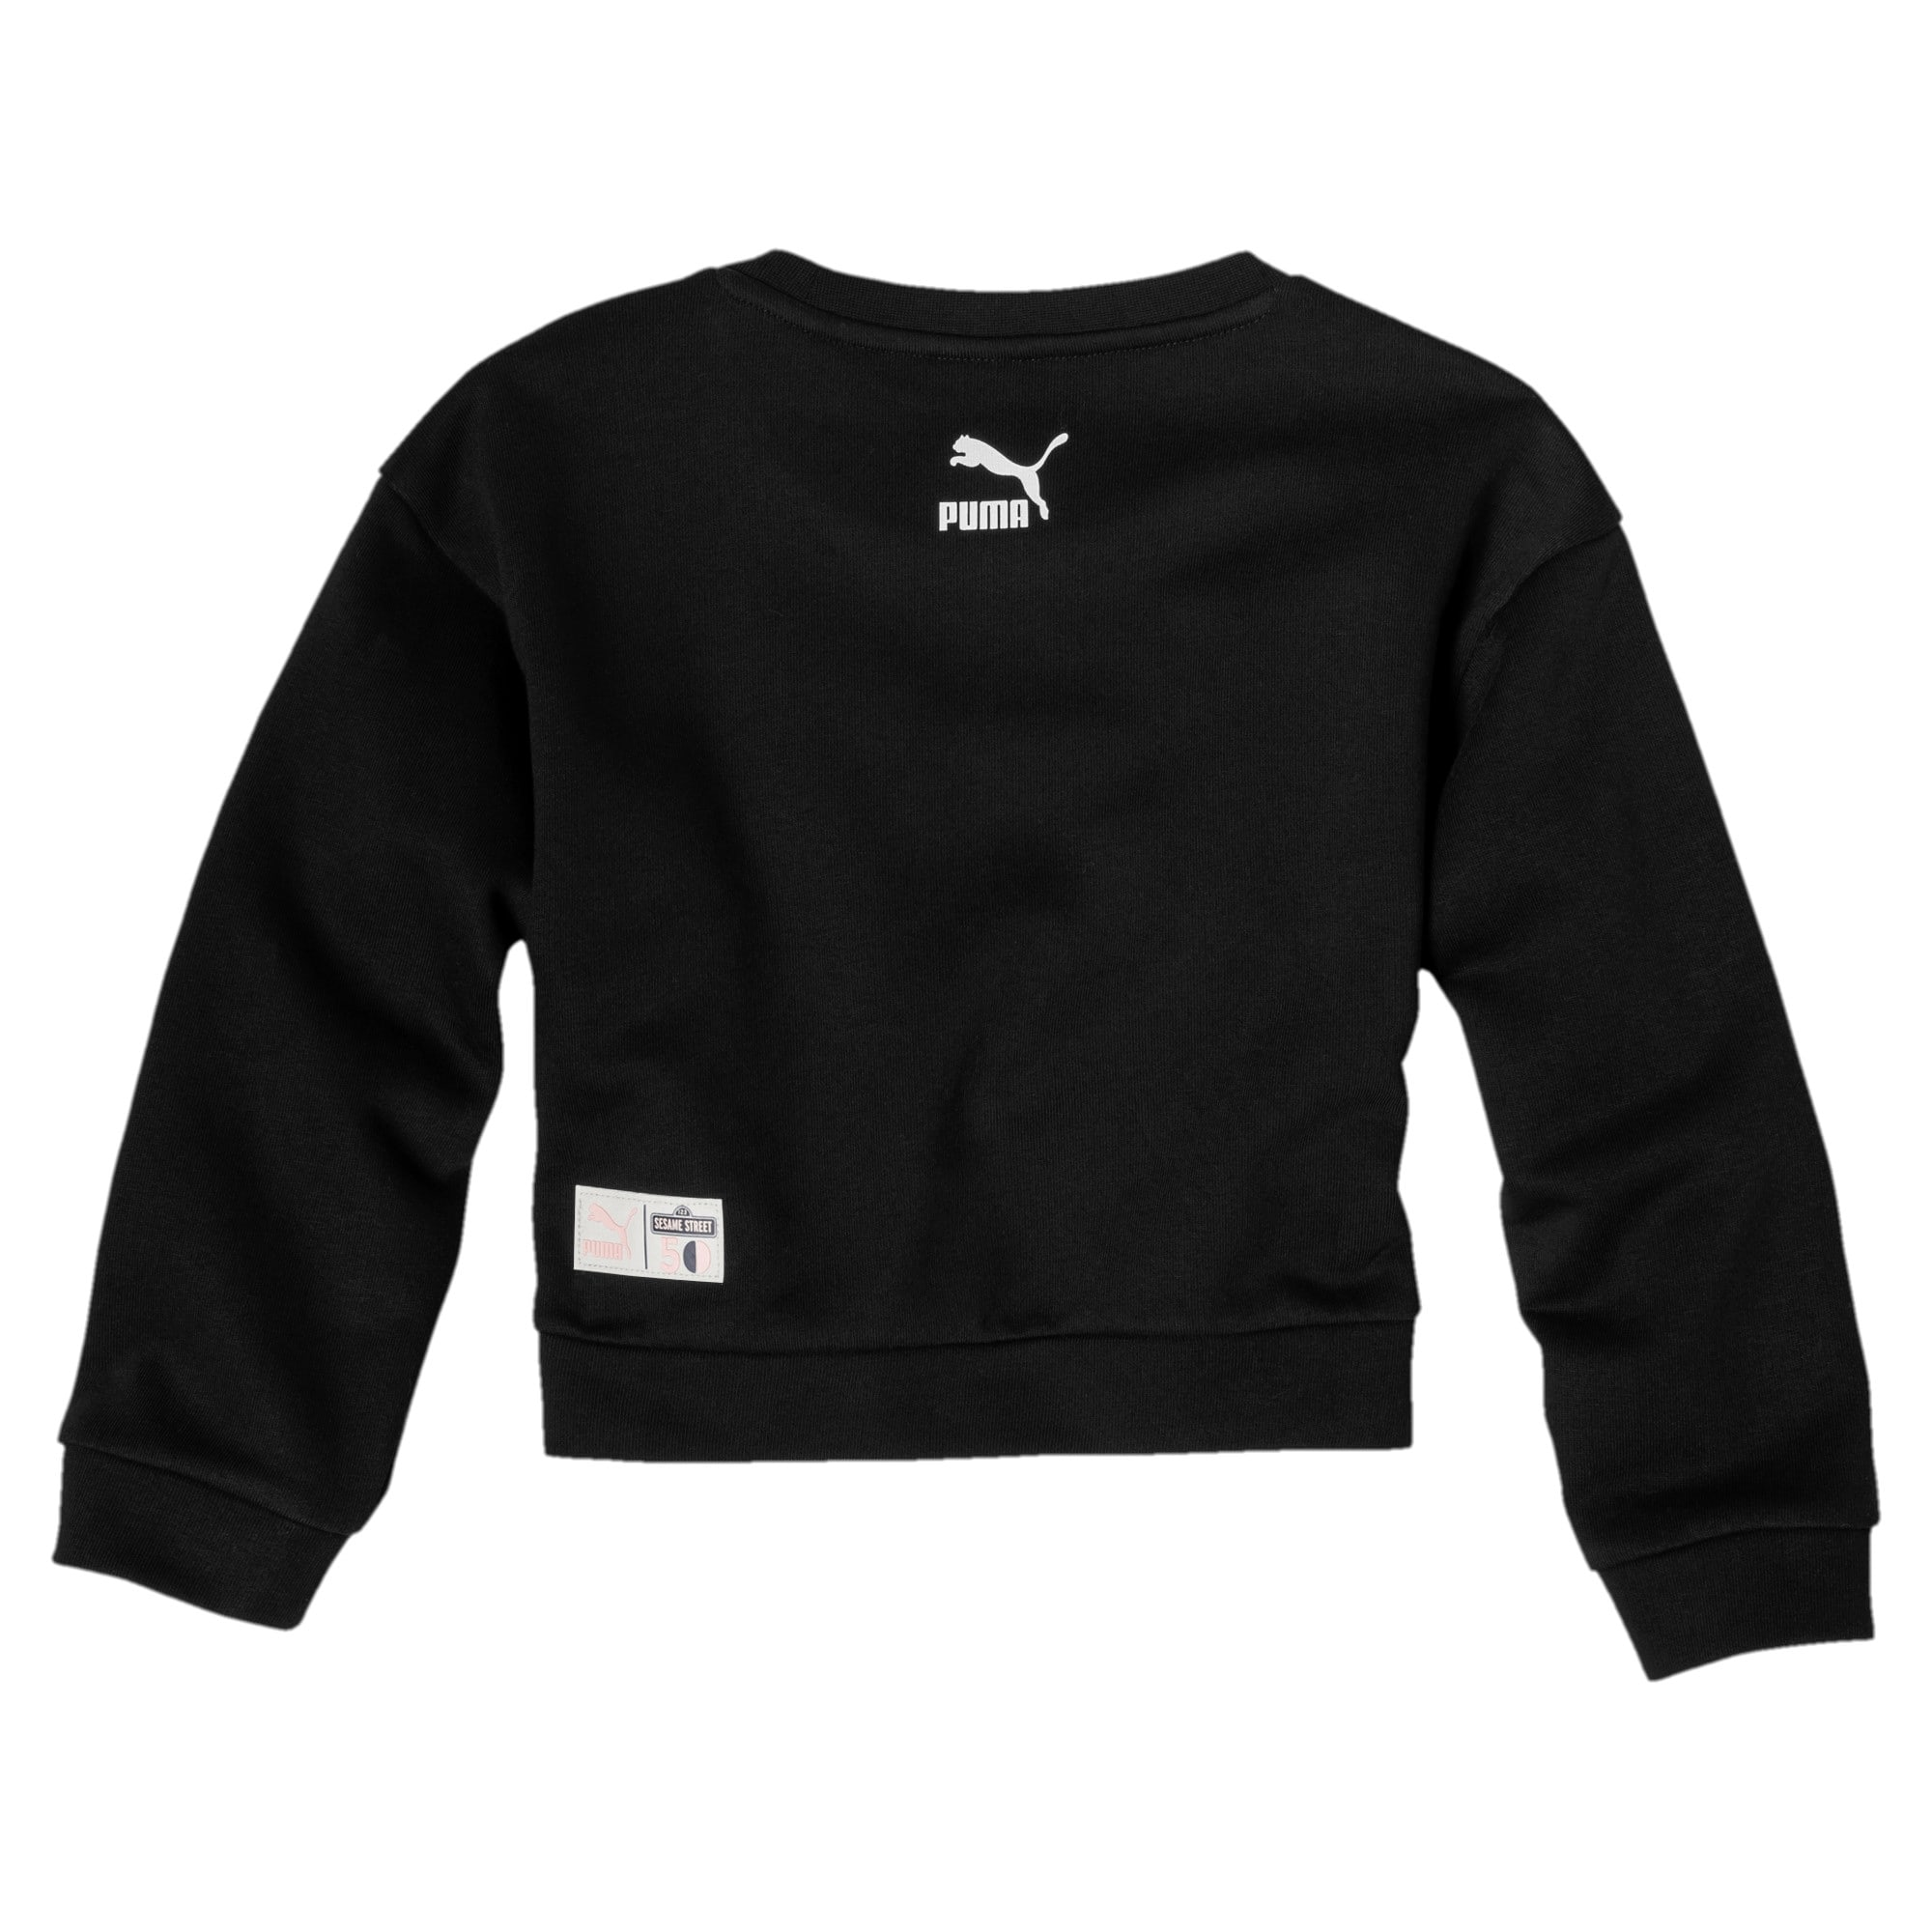 Miniatura 2 de Sudadera con cuello redondo PUMA x SESAME STREET para niña, Cotton Black, mediano